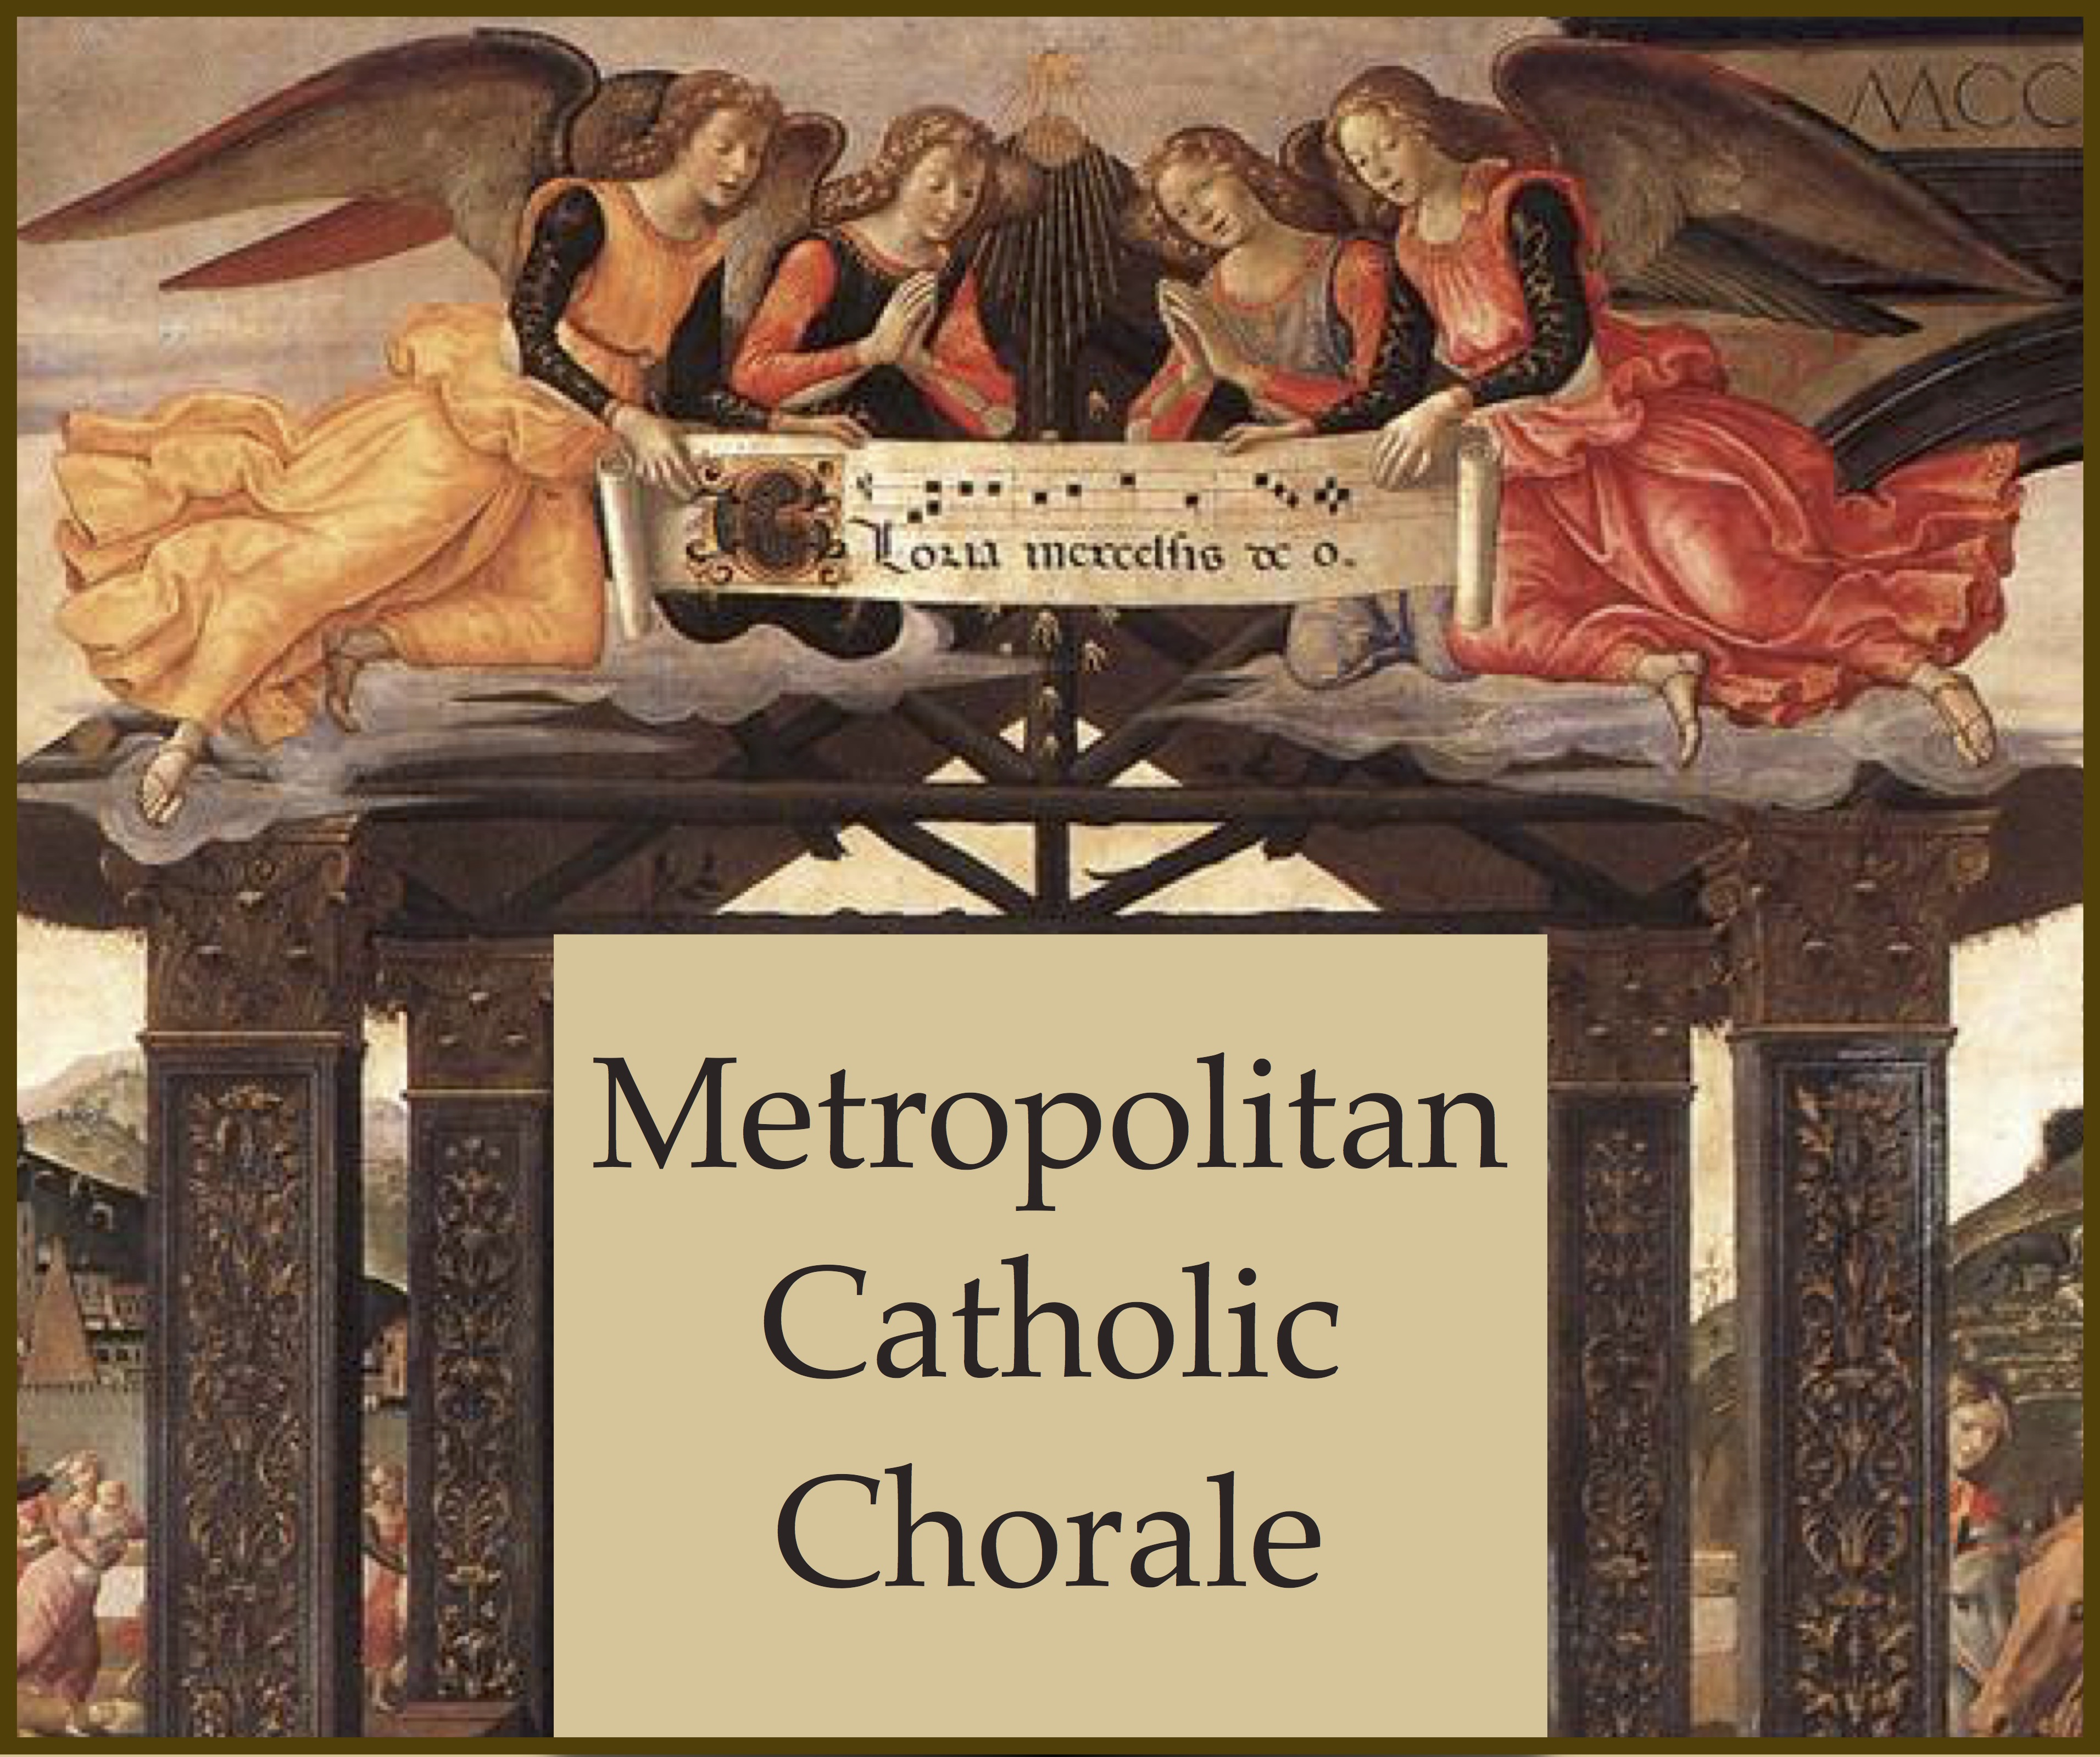 Metropolitan Catholic Chorale